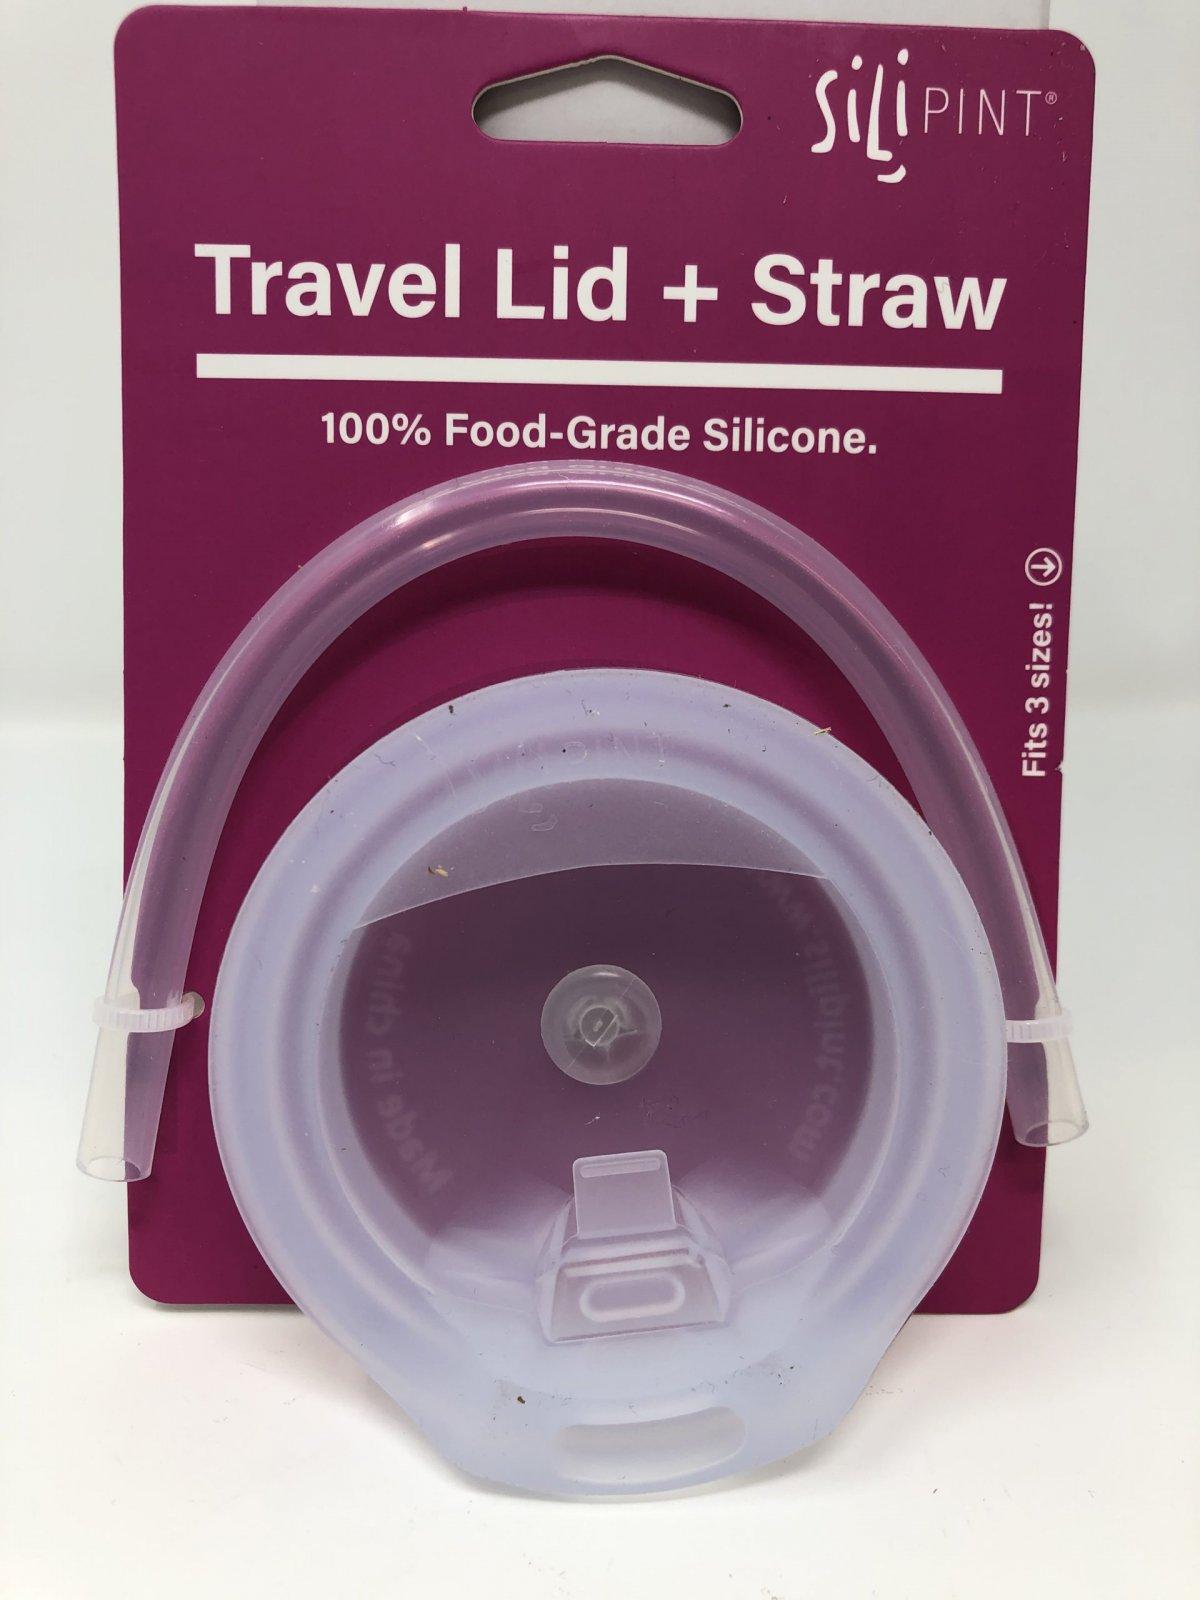 Silipint 8 oz Lid & Straw Pack